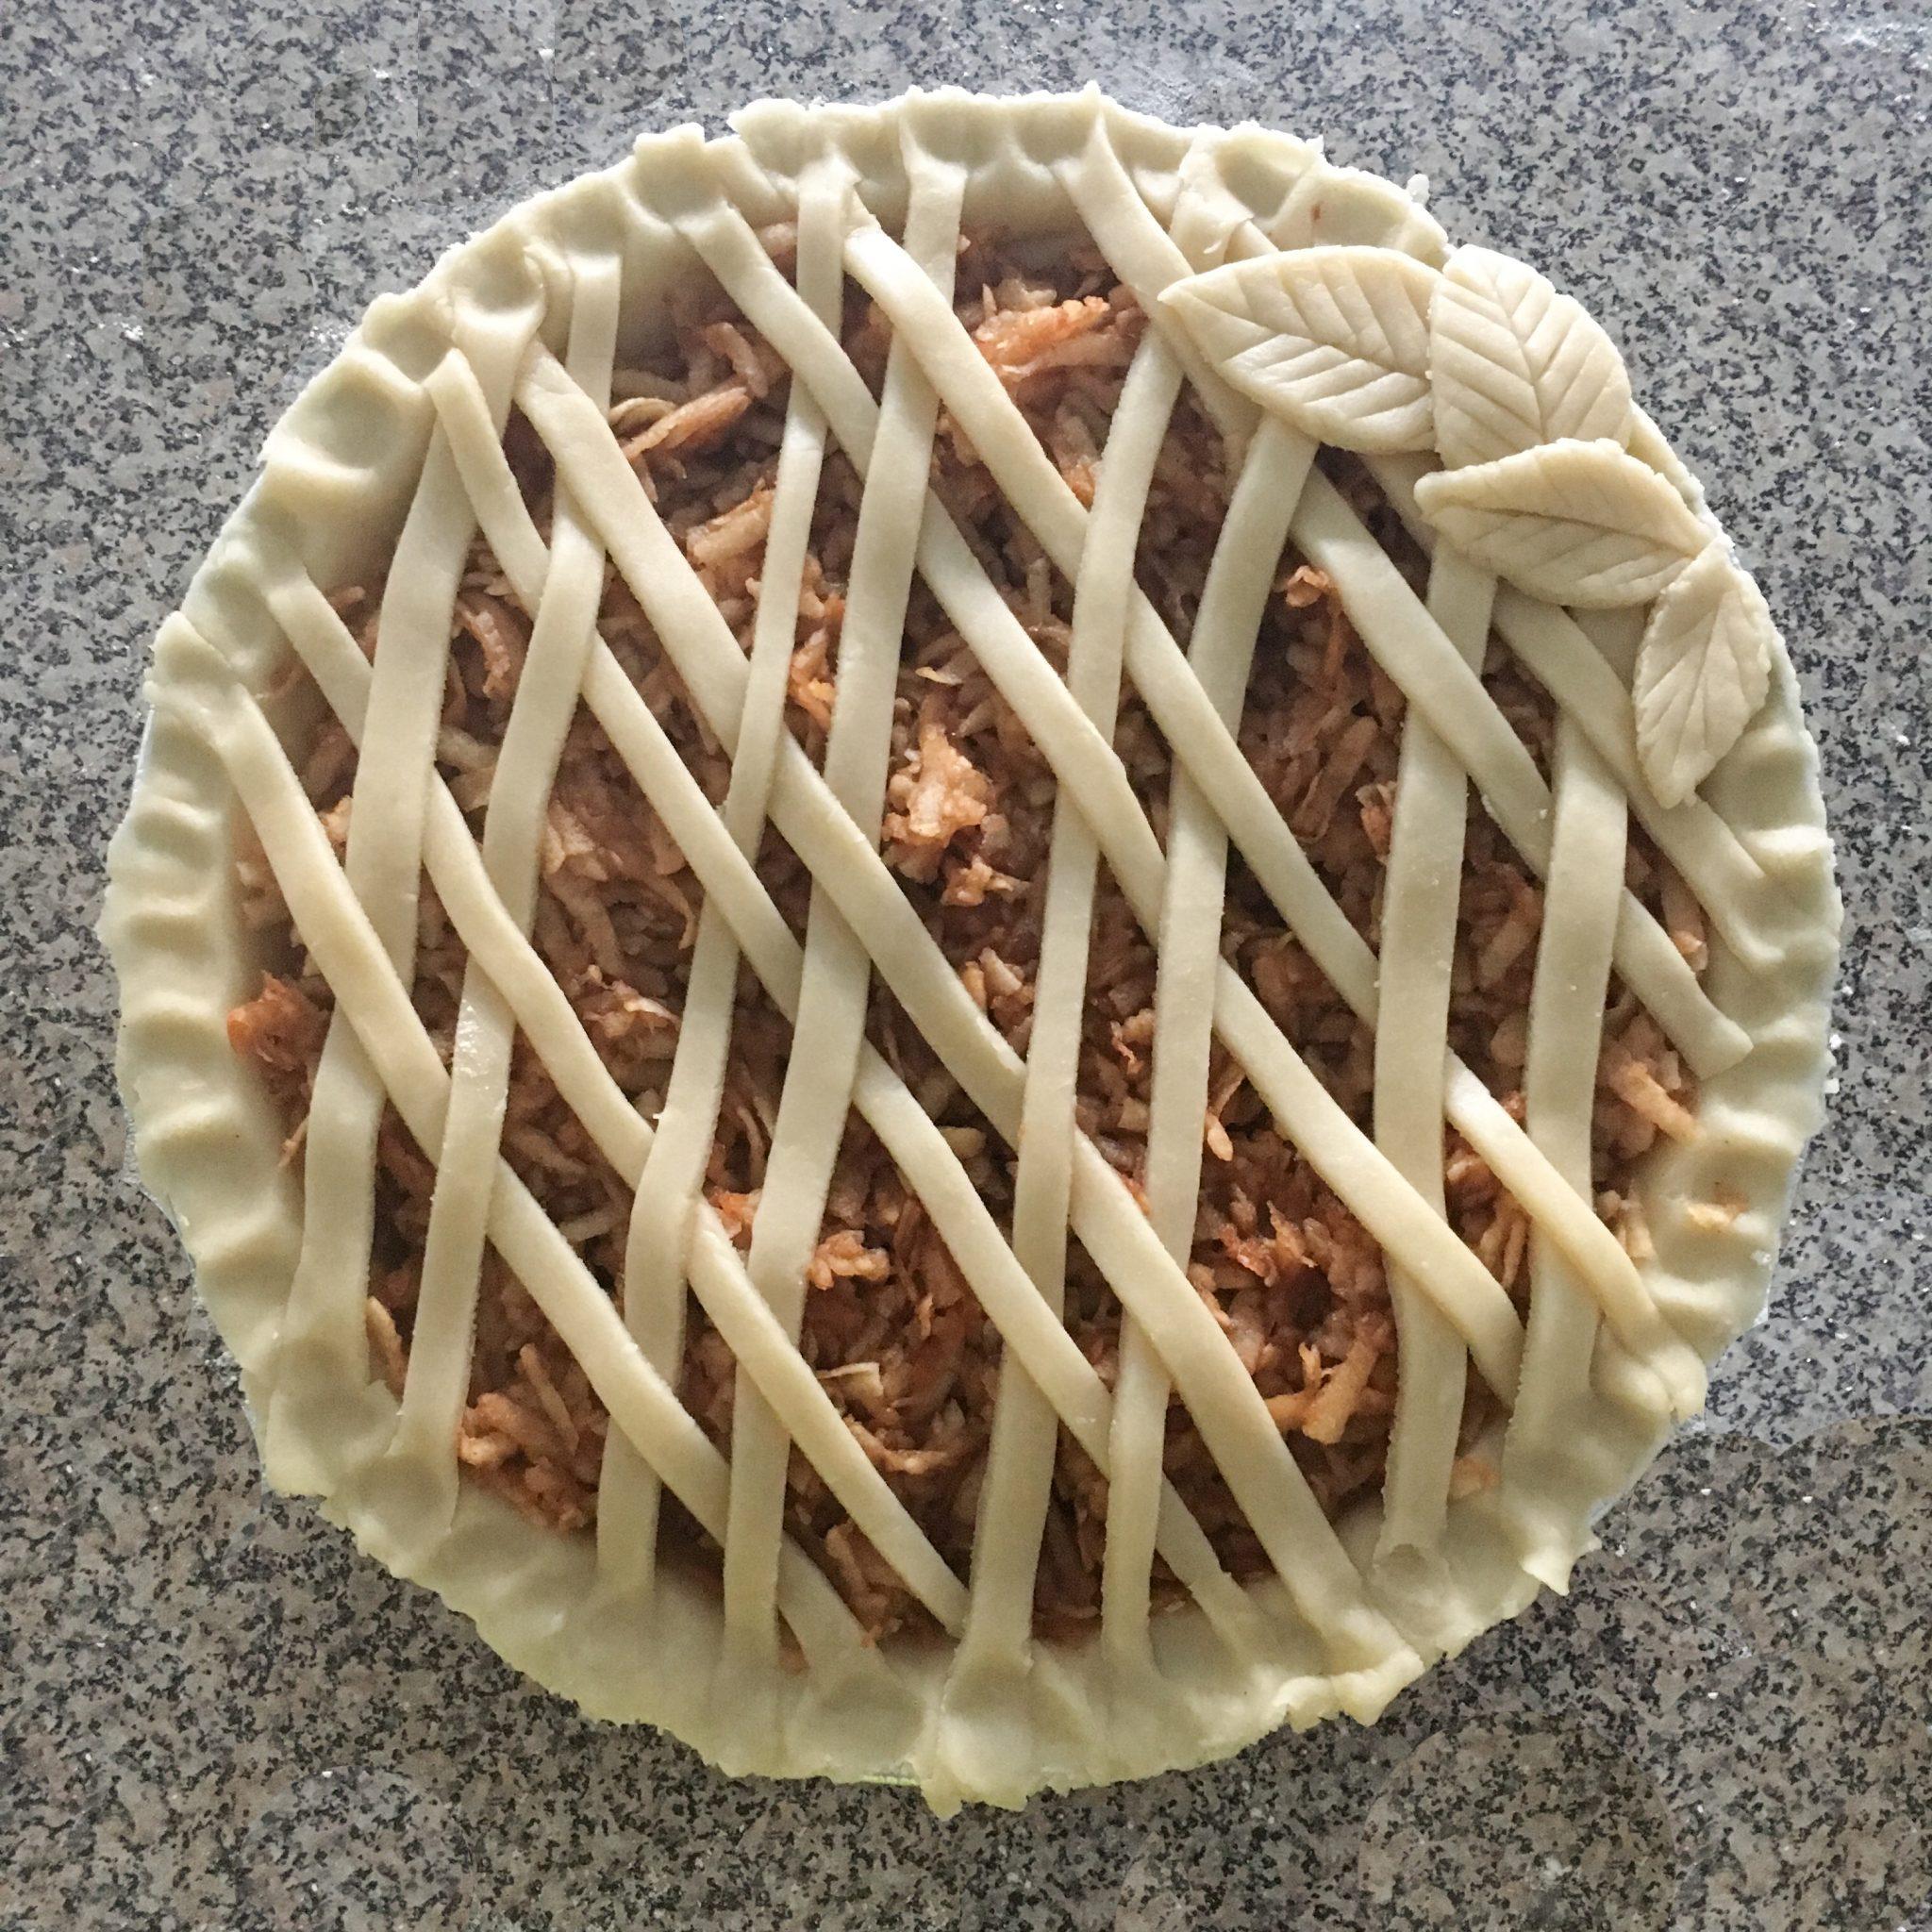 The-Hungarian-Brunette-creative-pie-crust-2-of-2.jpg